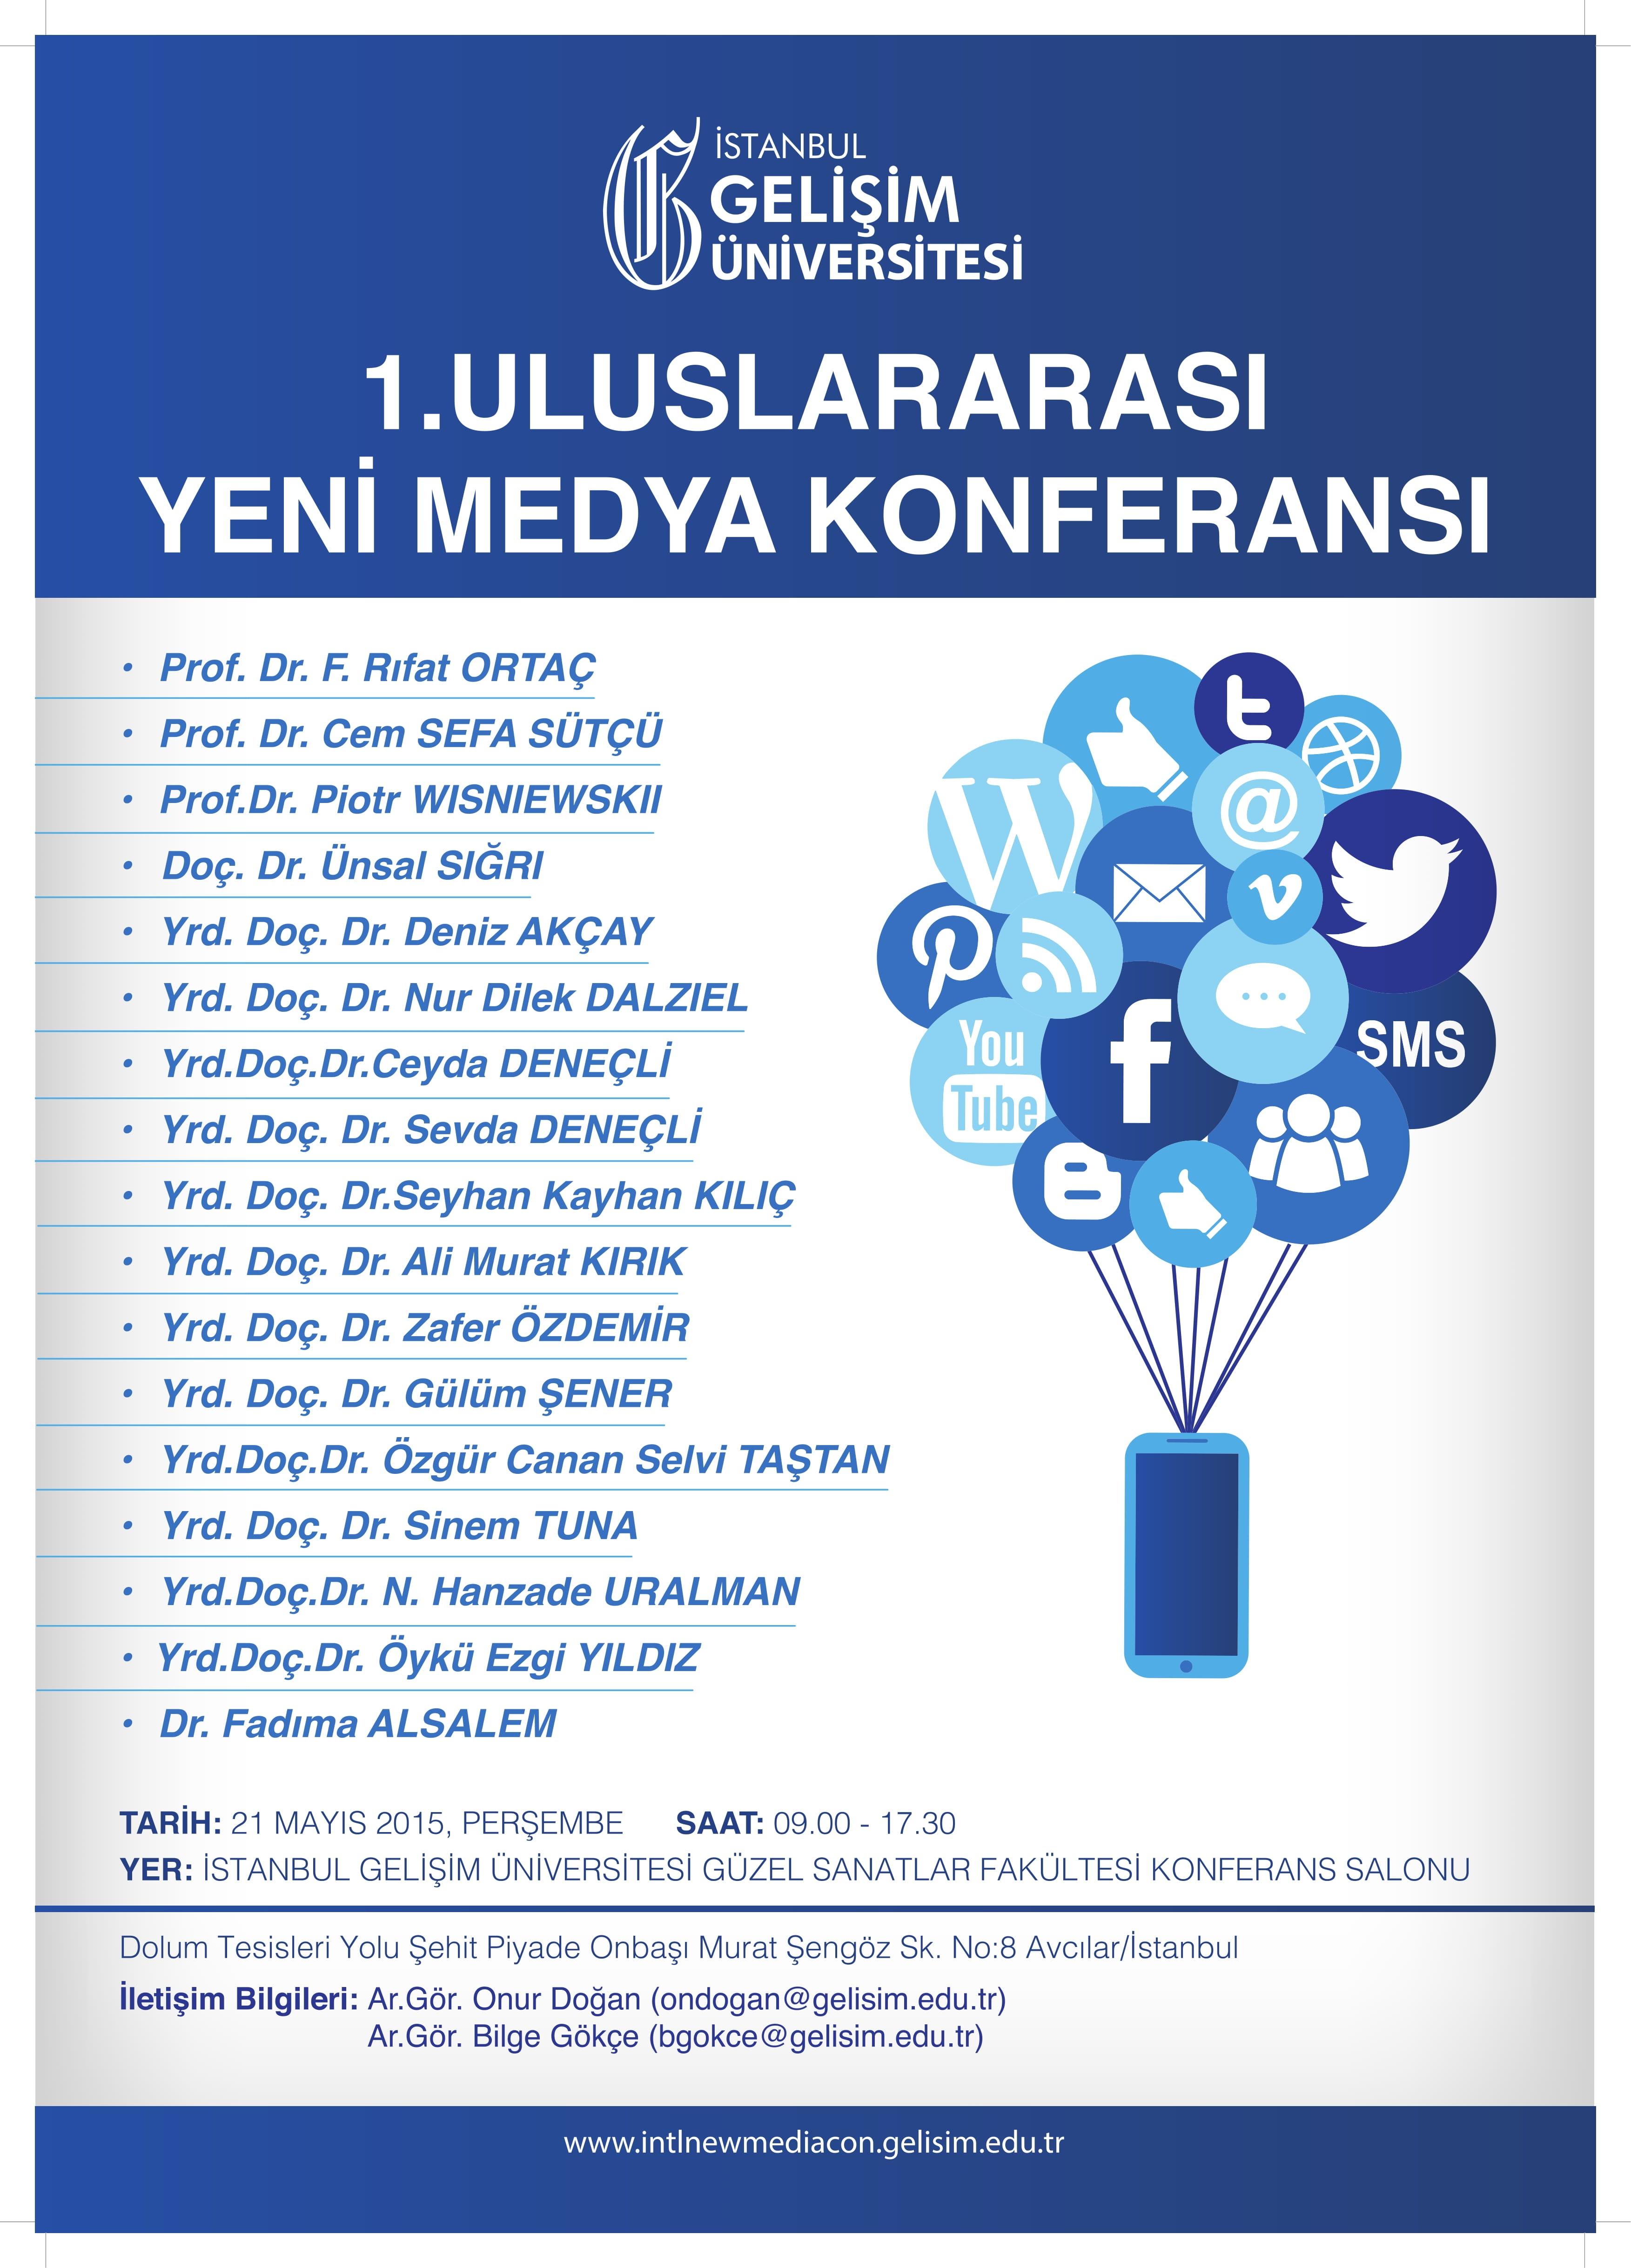 1.yenü_medya_konferansı